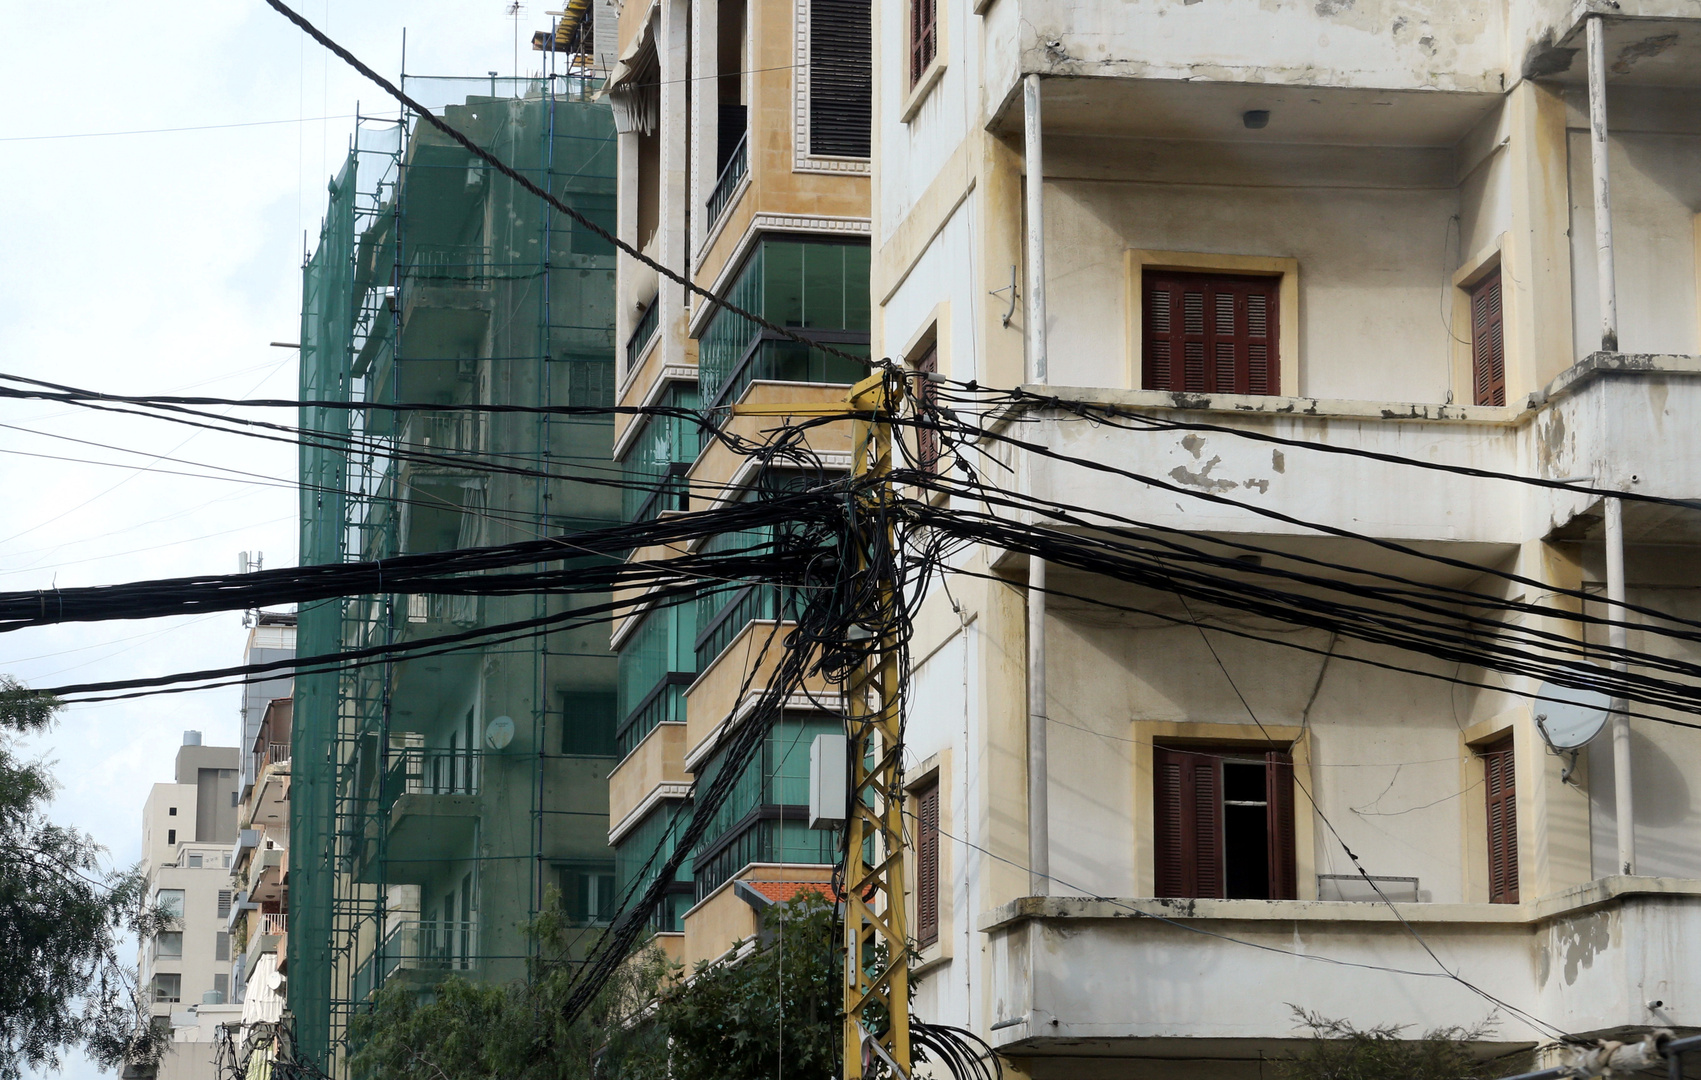 نائب لبناني: قانون قيصر وراء انقطاع الكهرباء